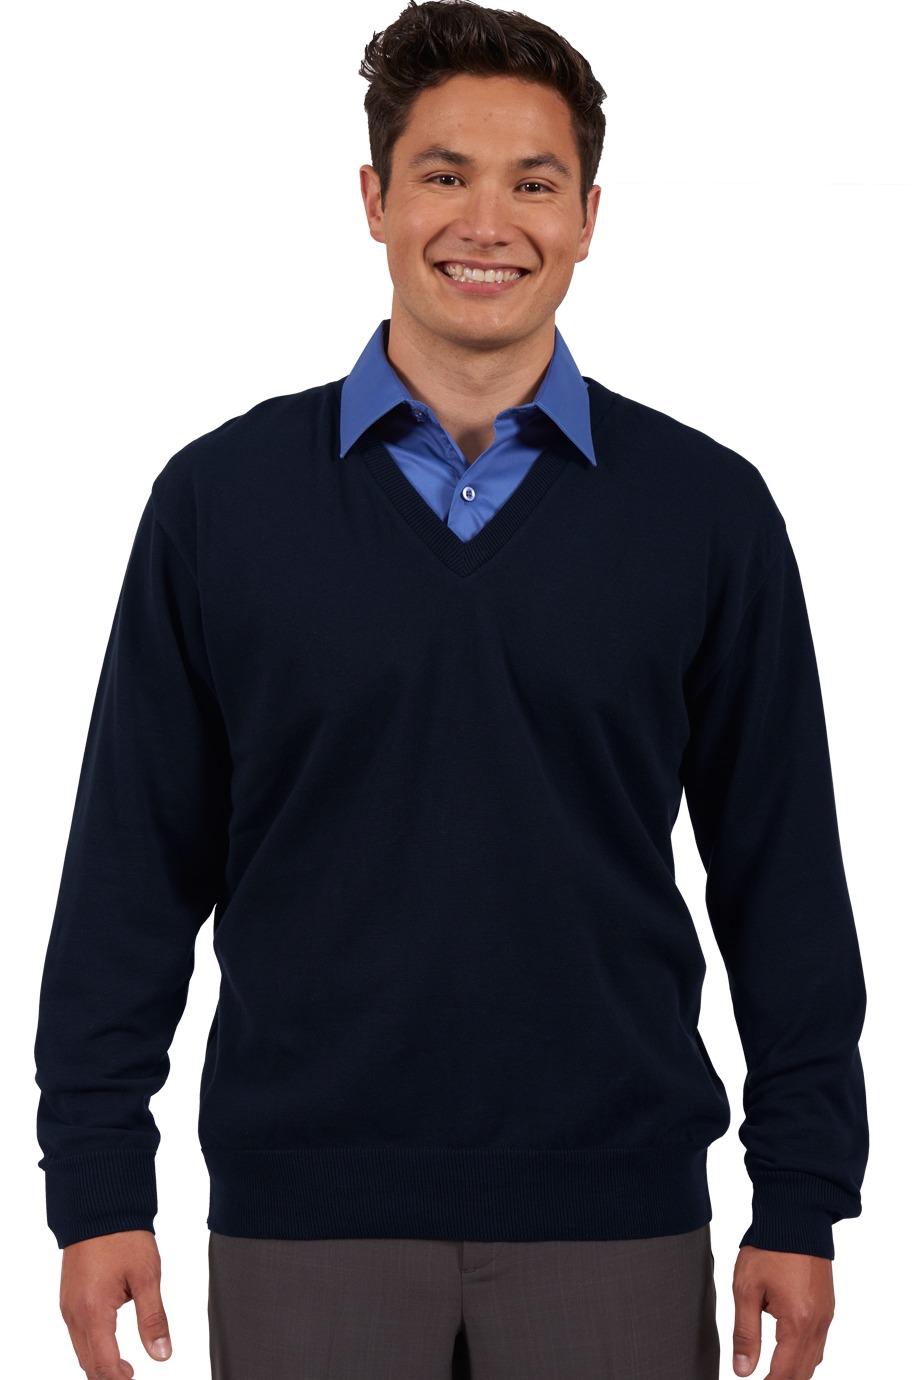 47e2abfb4a7 Edwards Garment 4090 - Fine Gauge V neck Sweater  30.32 - Sweater